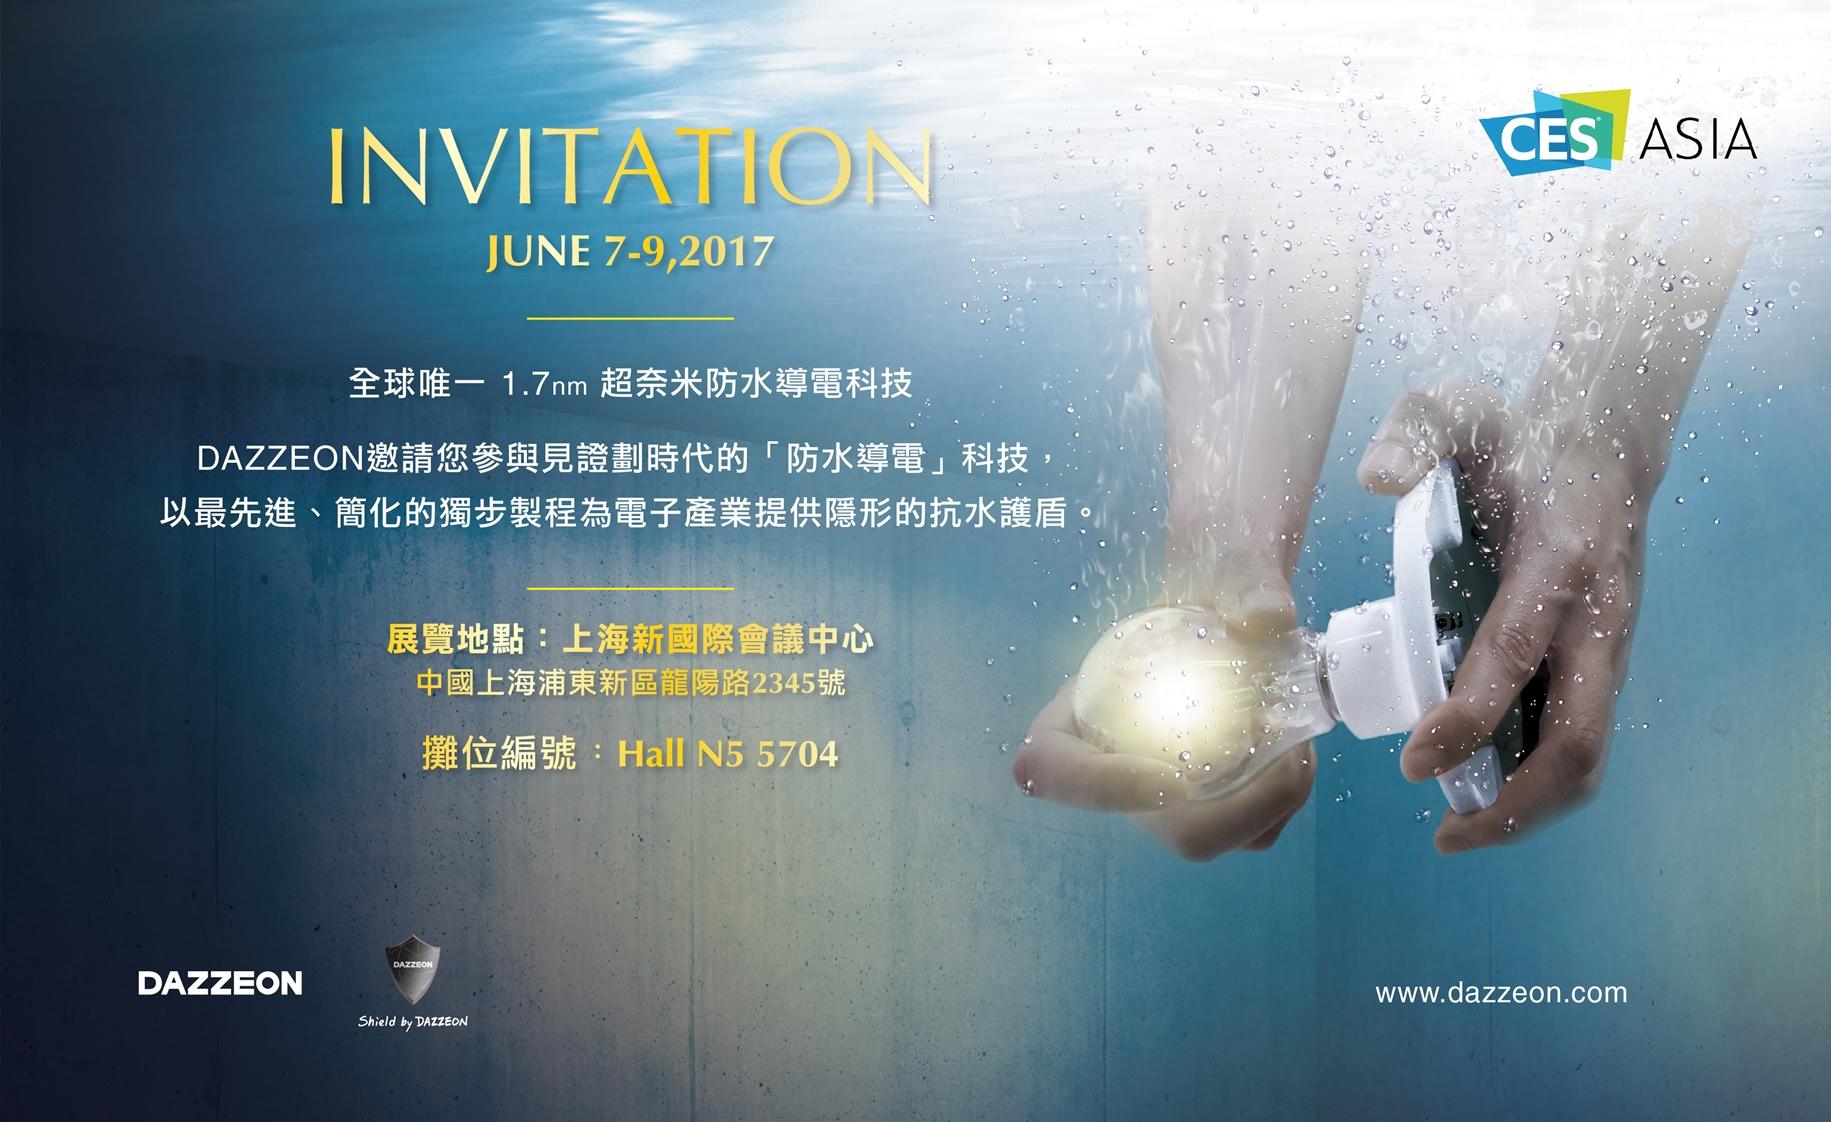 CES-Asia-invitation-v2-02